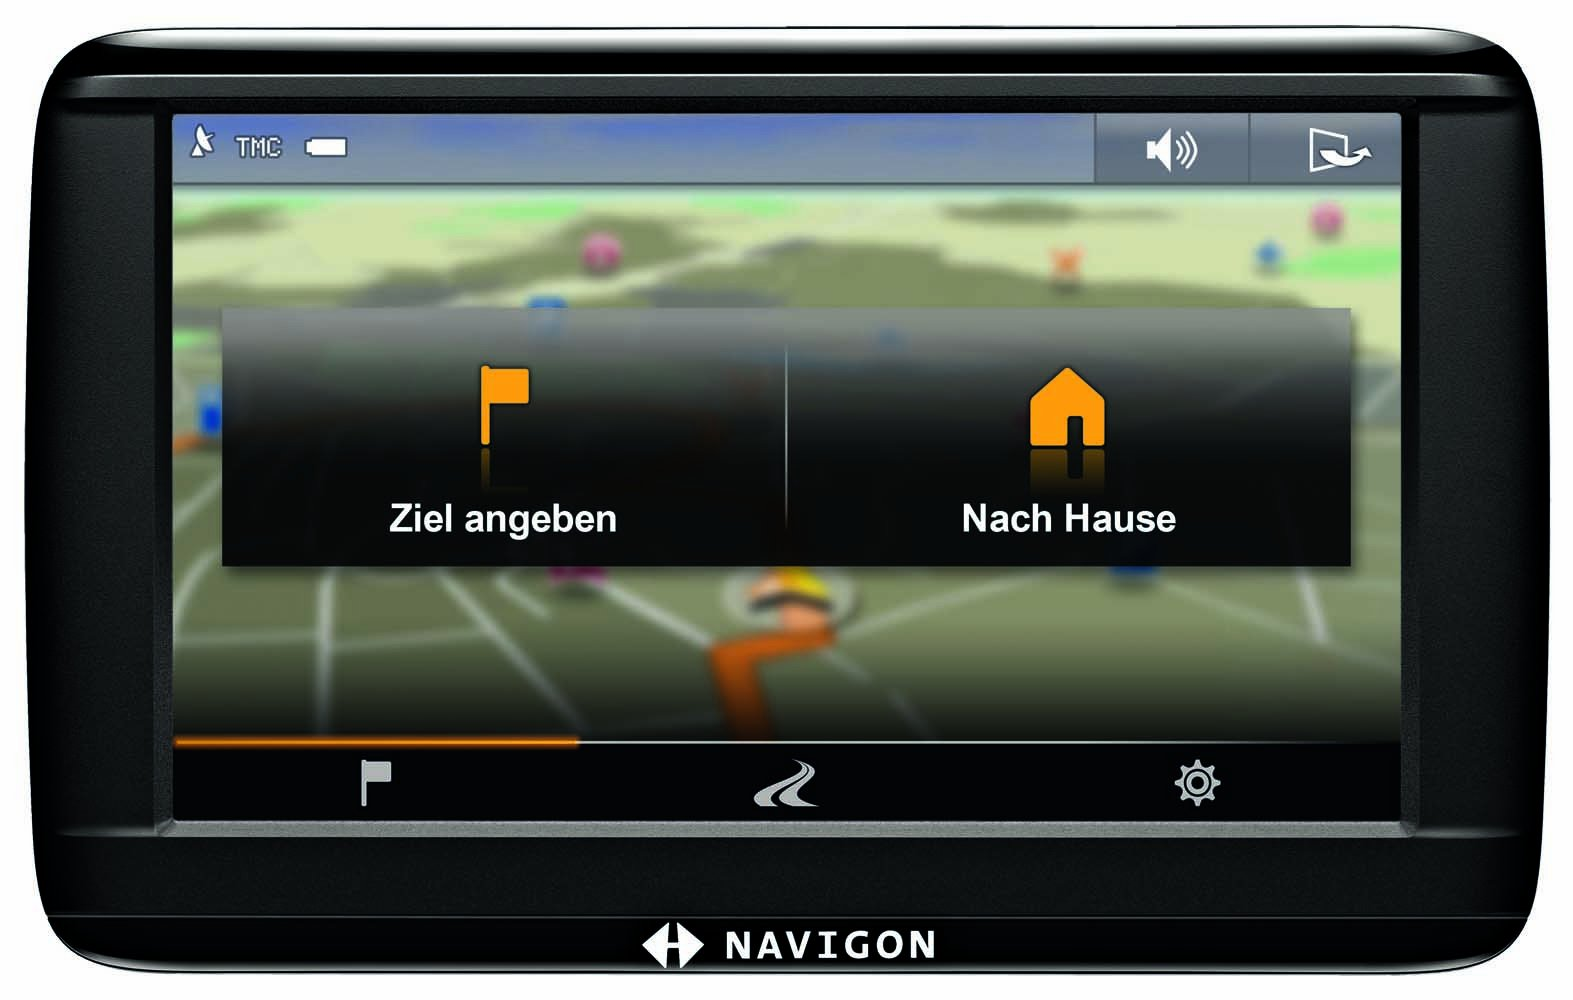 NAVIGON-42PARENT